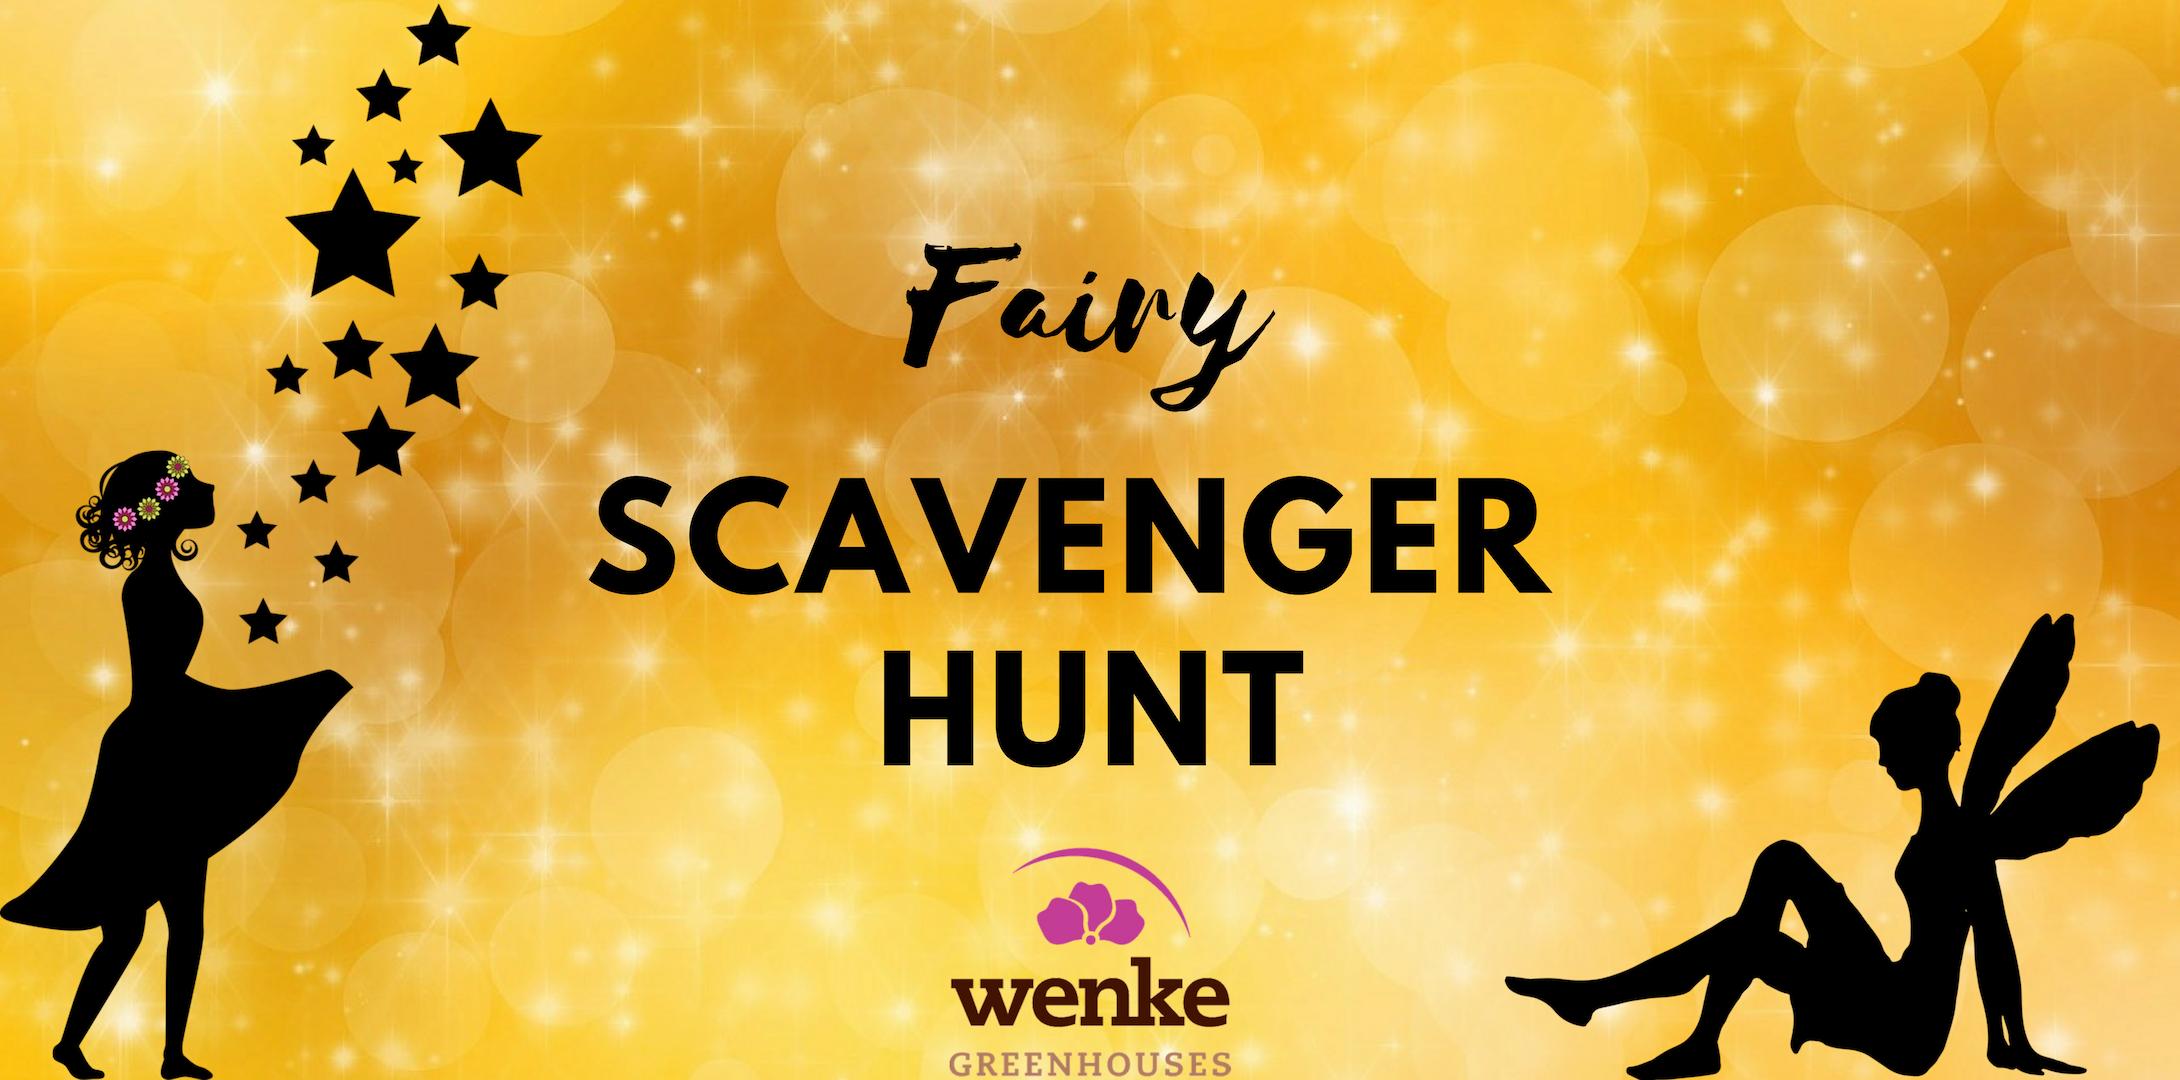 4/6/19 Kids Activity Fairy Scavenger Hunt 10am